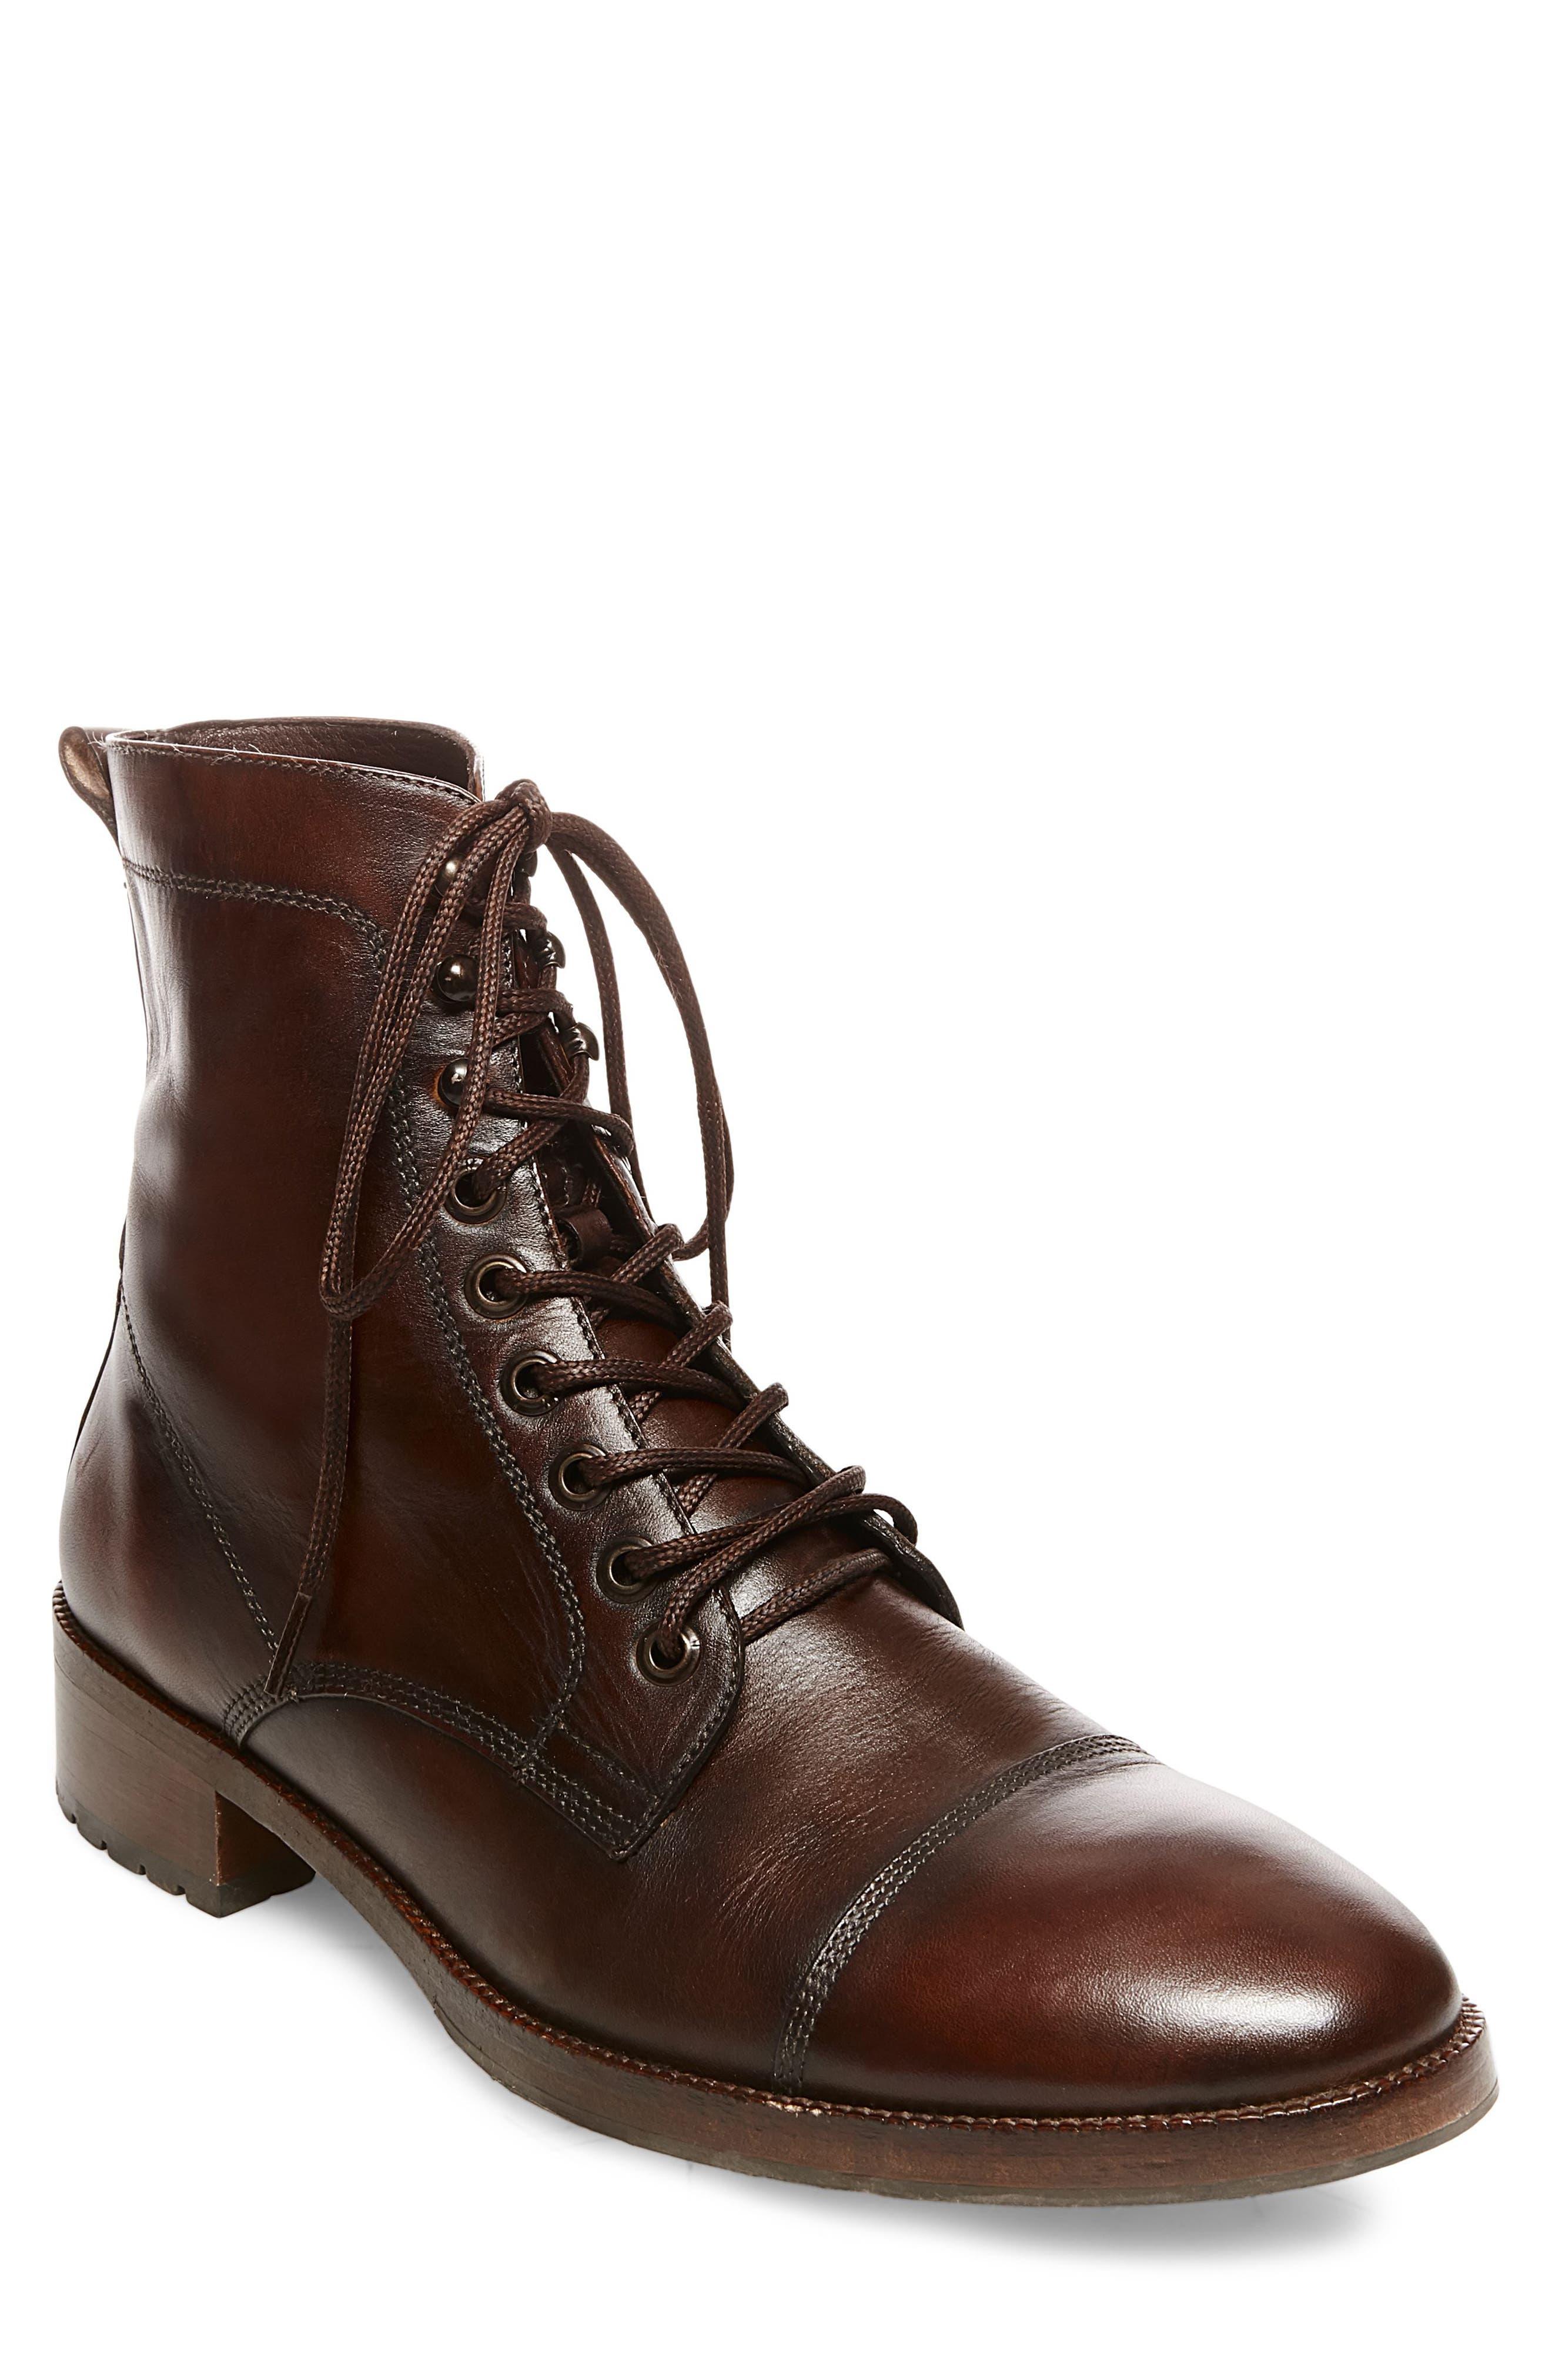 Main Image - Steve Madden x GQ Ted Cap Toe Boot (Men)